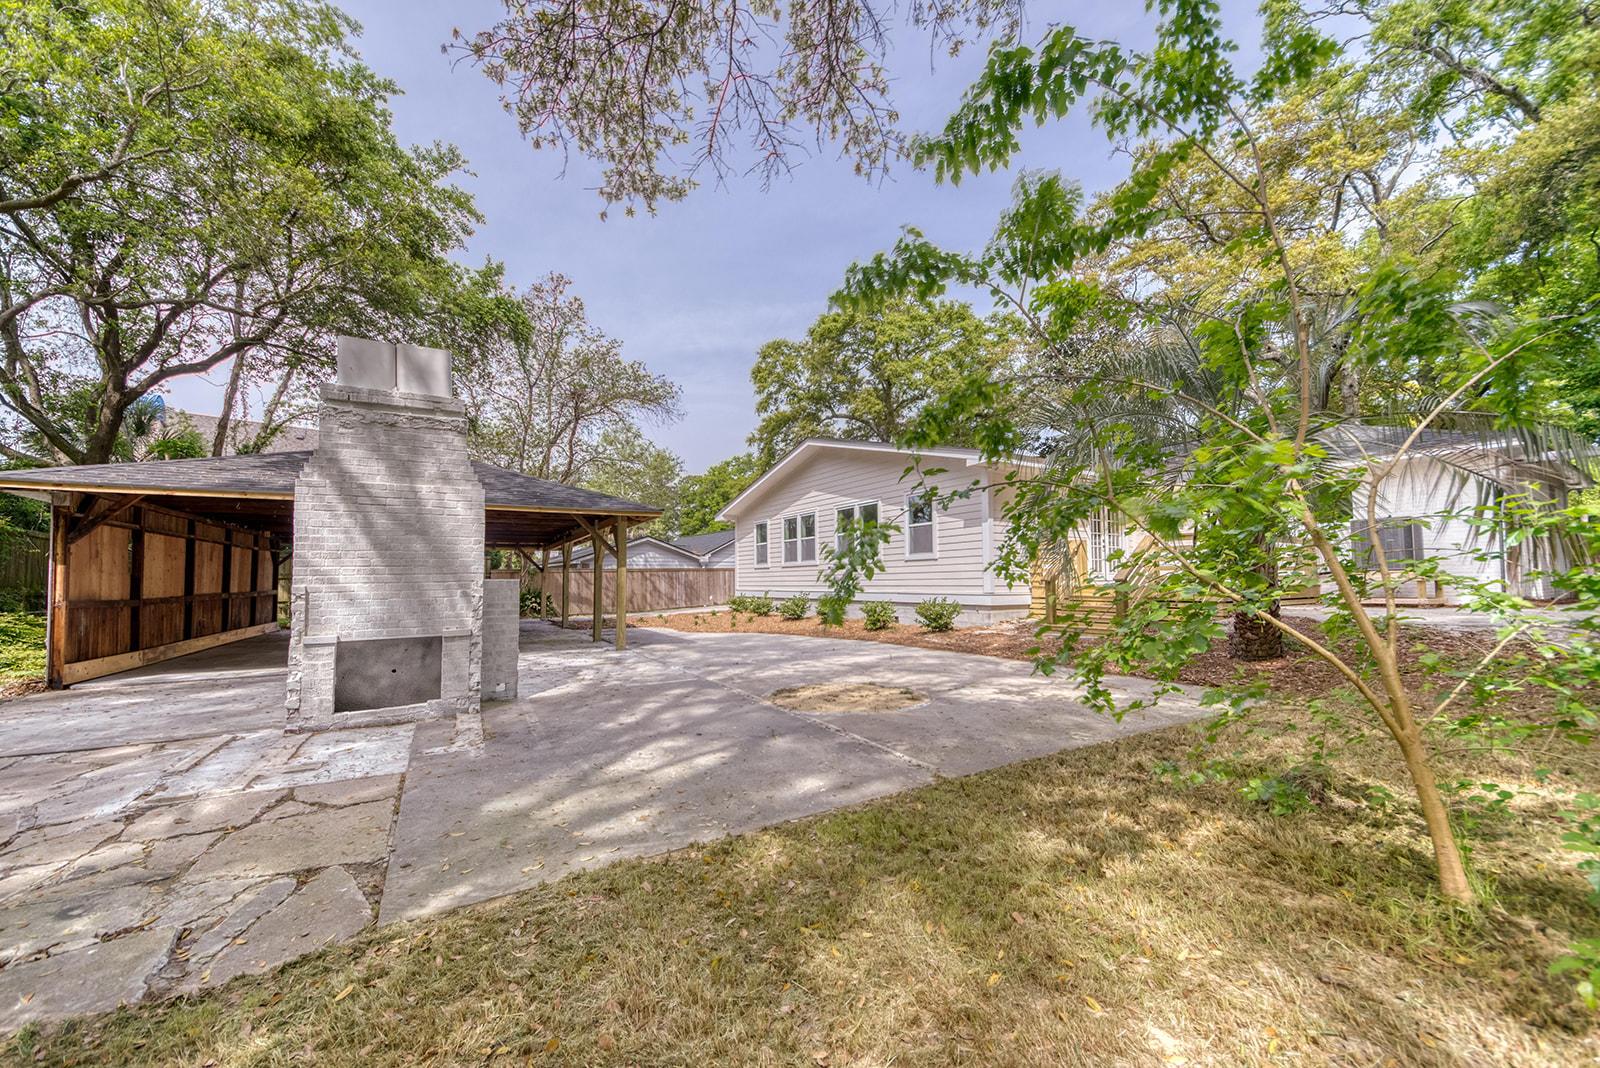 Bay View Acres Homes For Sale - 265 Coleman, Mount Pleasant, SC - 44